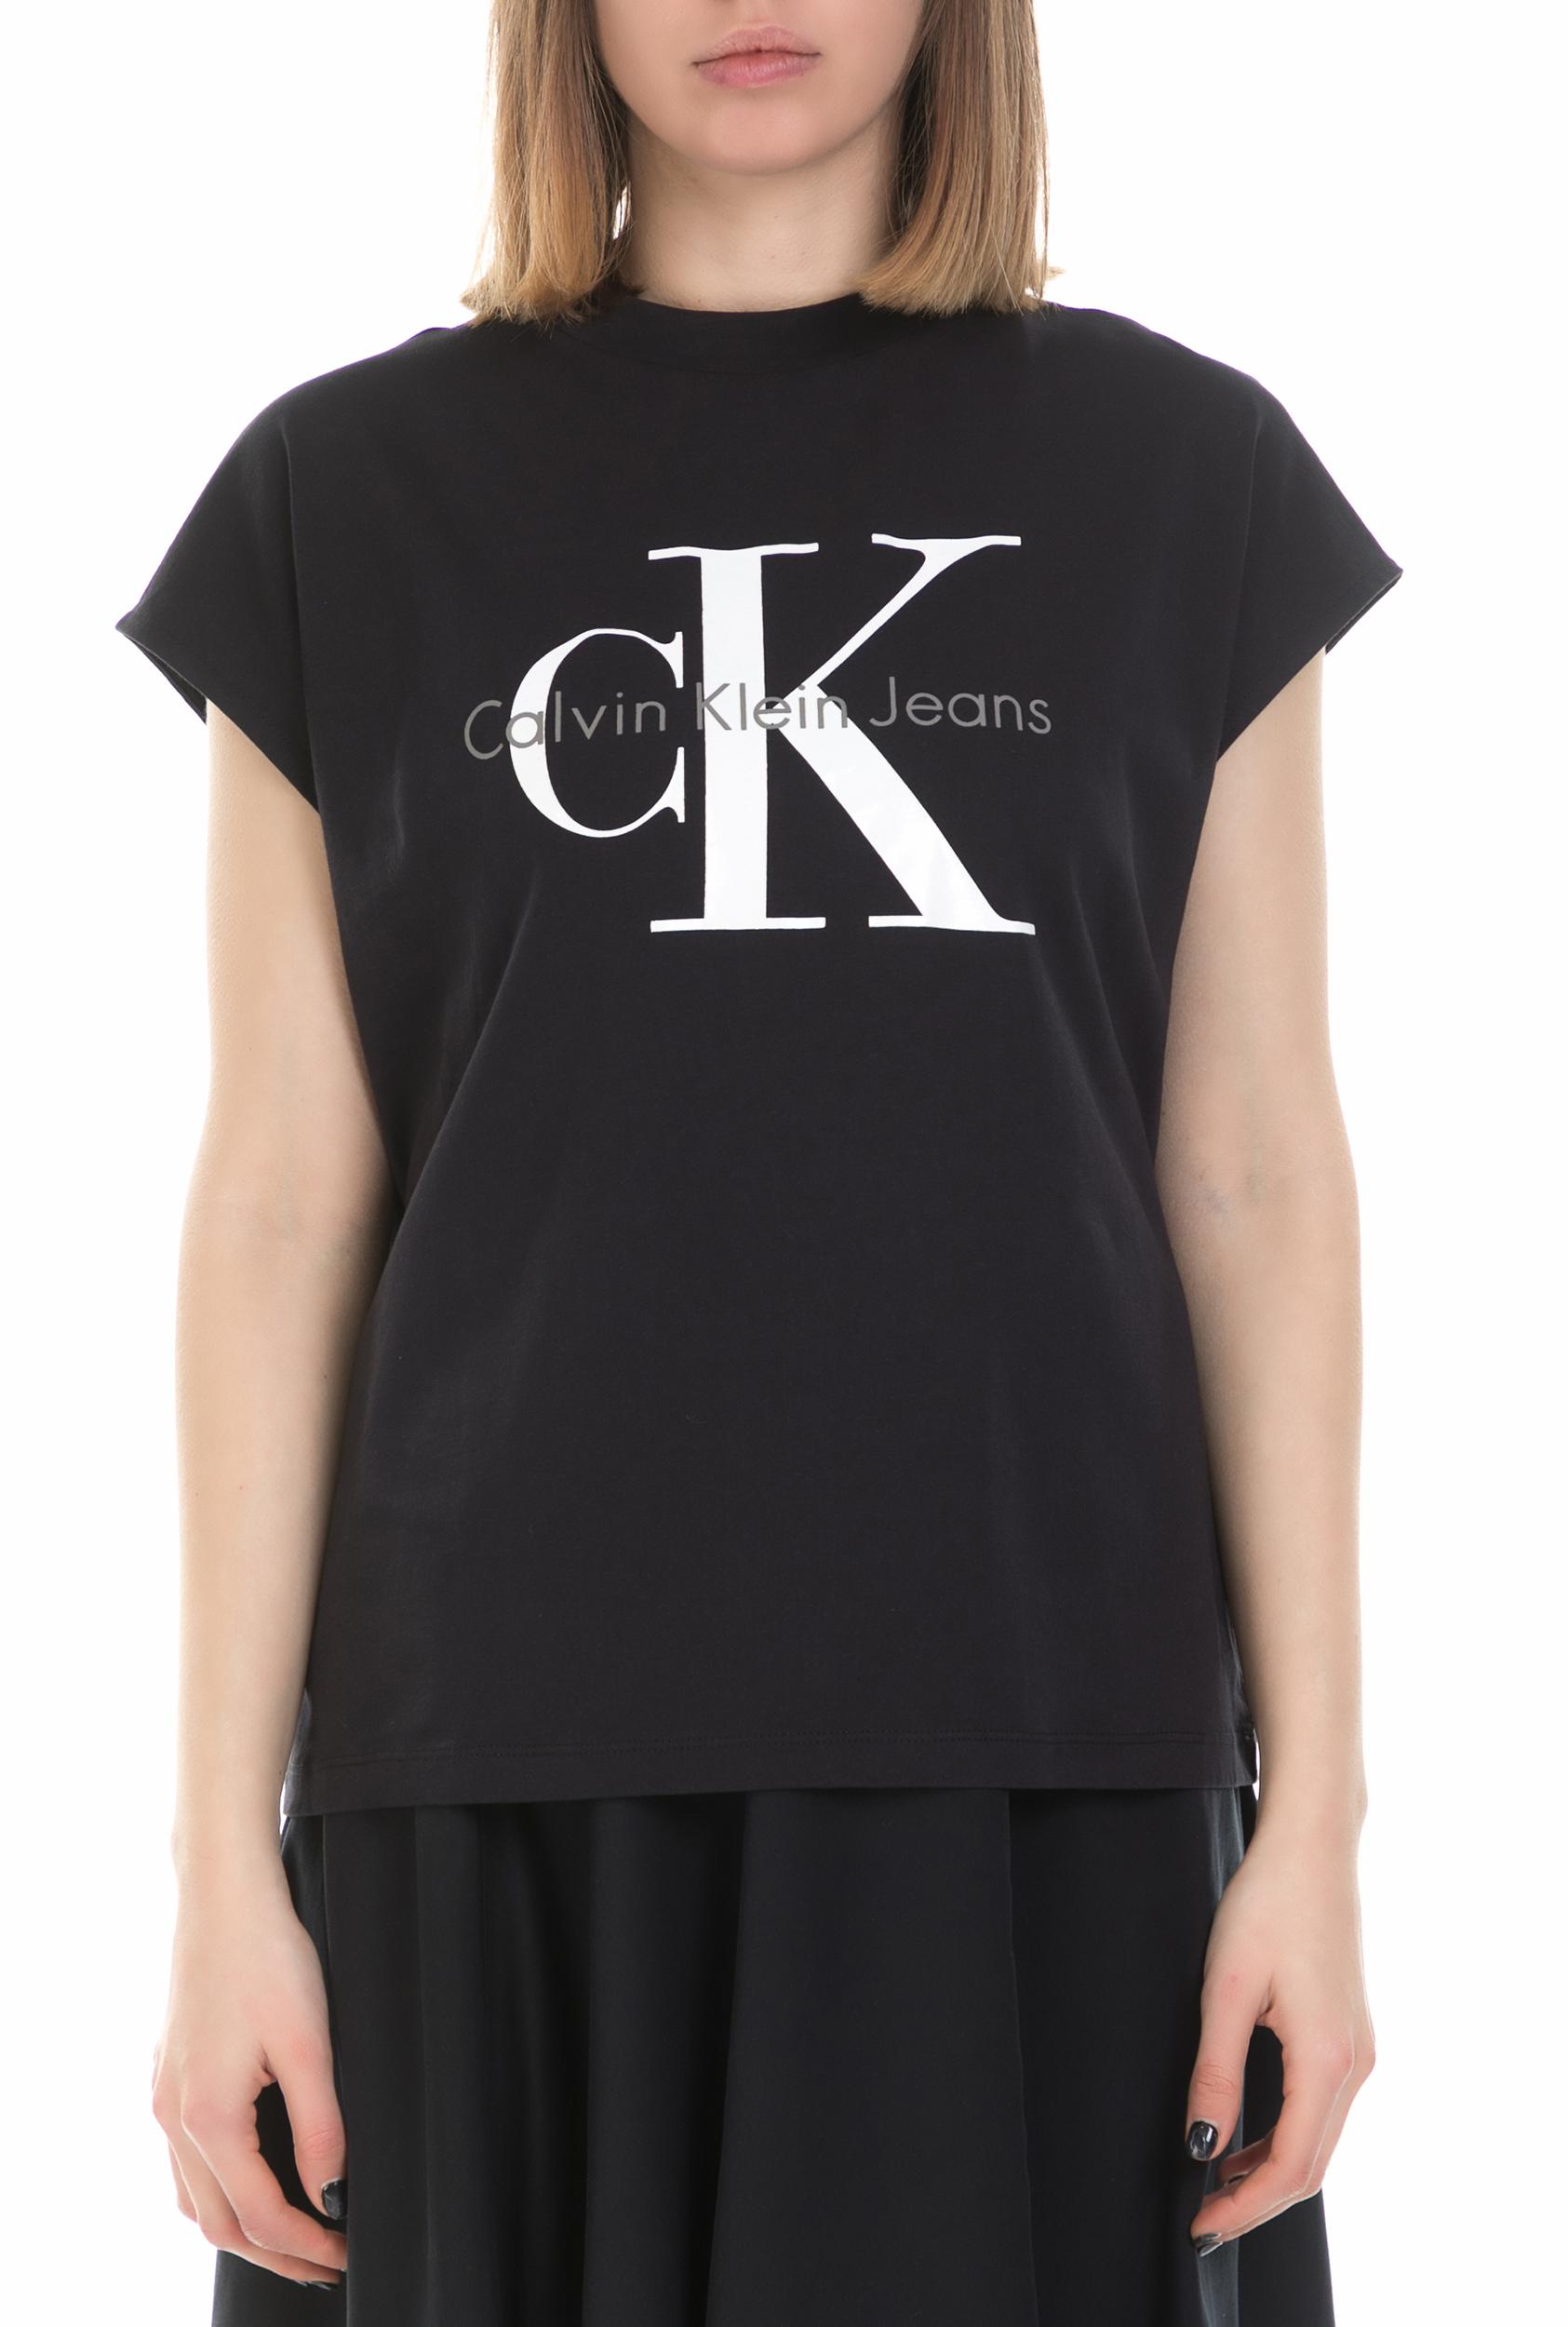 57c2f5f5b817 CALVIN KLEIN JEANS - Γυναικεία κοντομάνικη μπλούζα Calvin Klein Jeans μαύρη